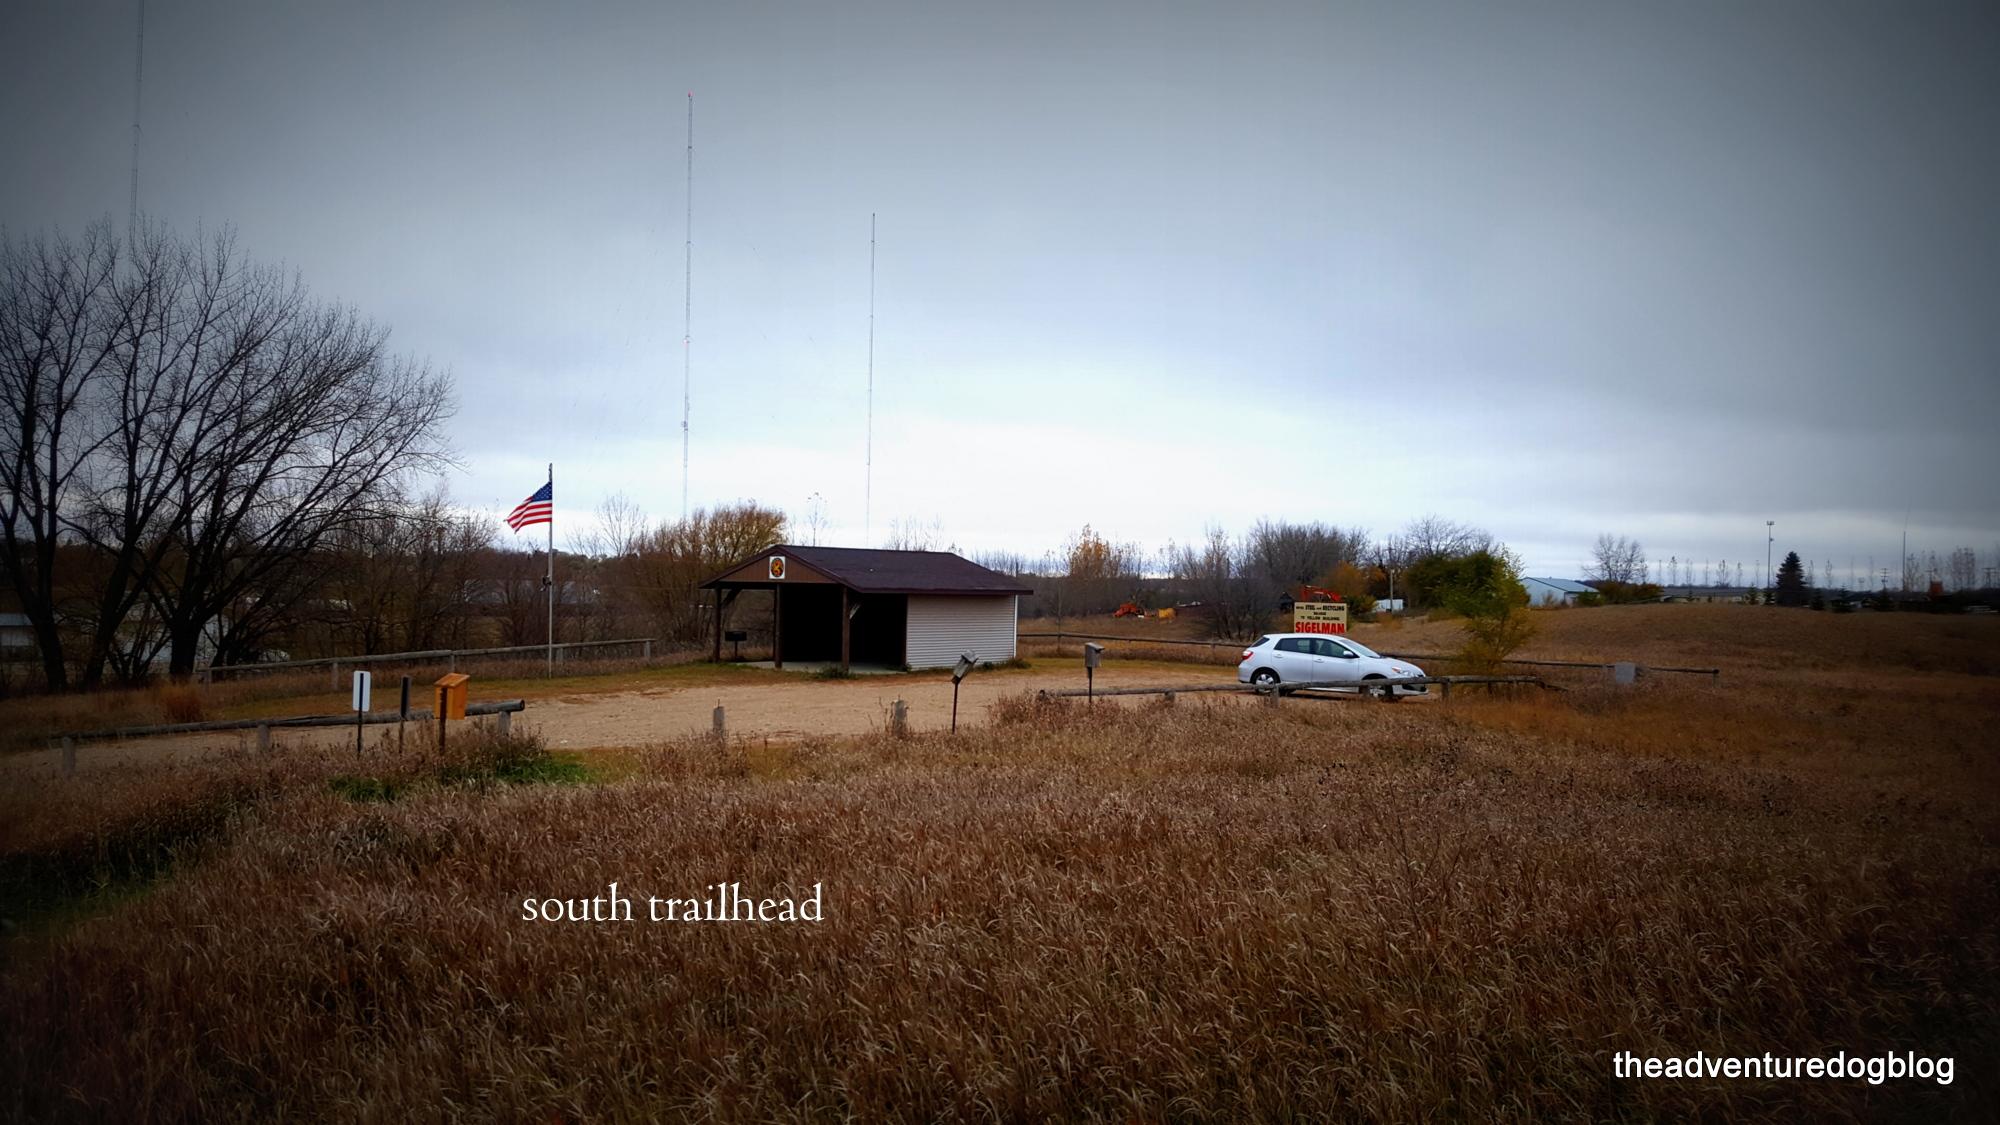 South Trailhead